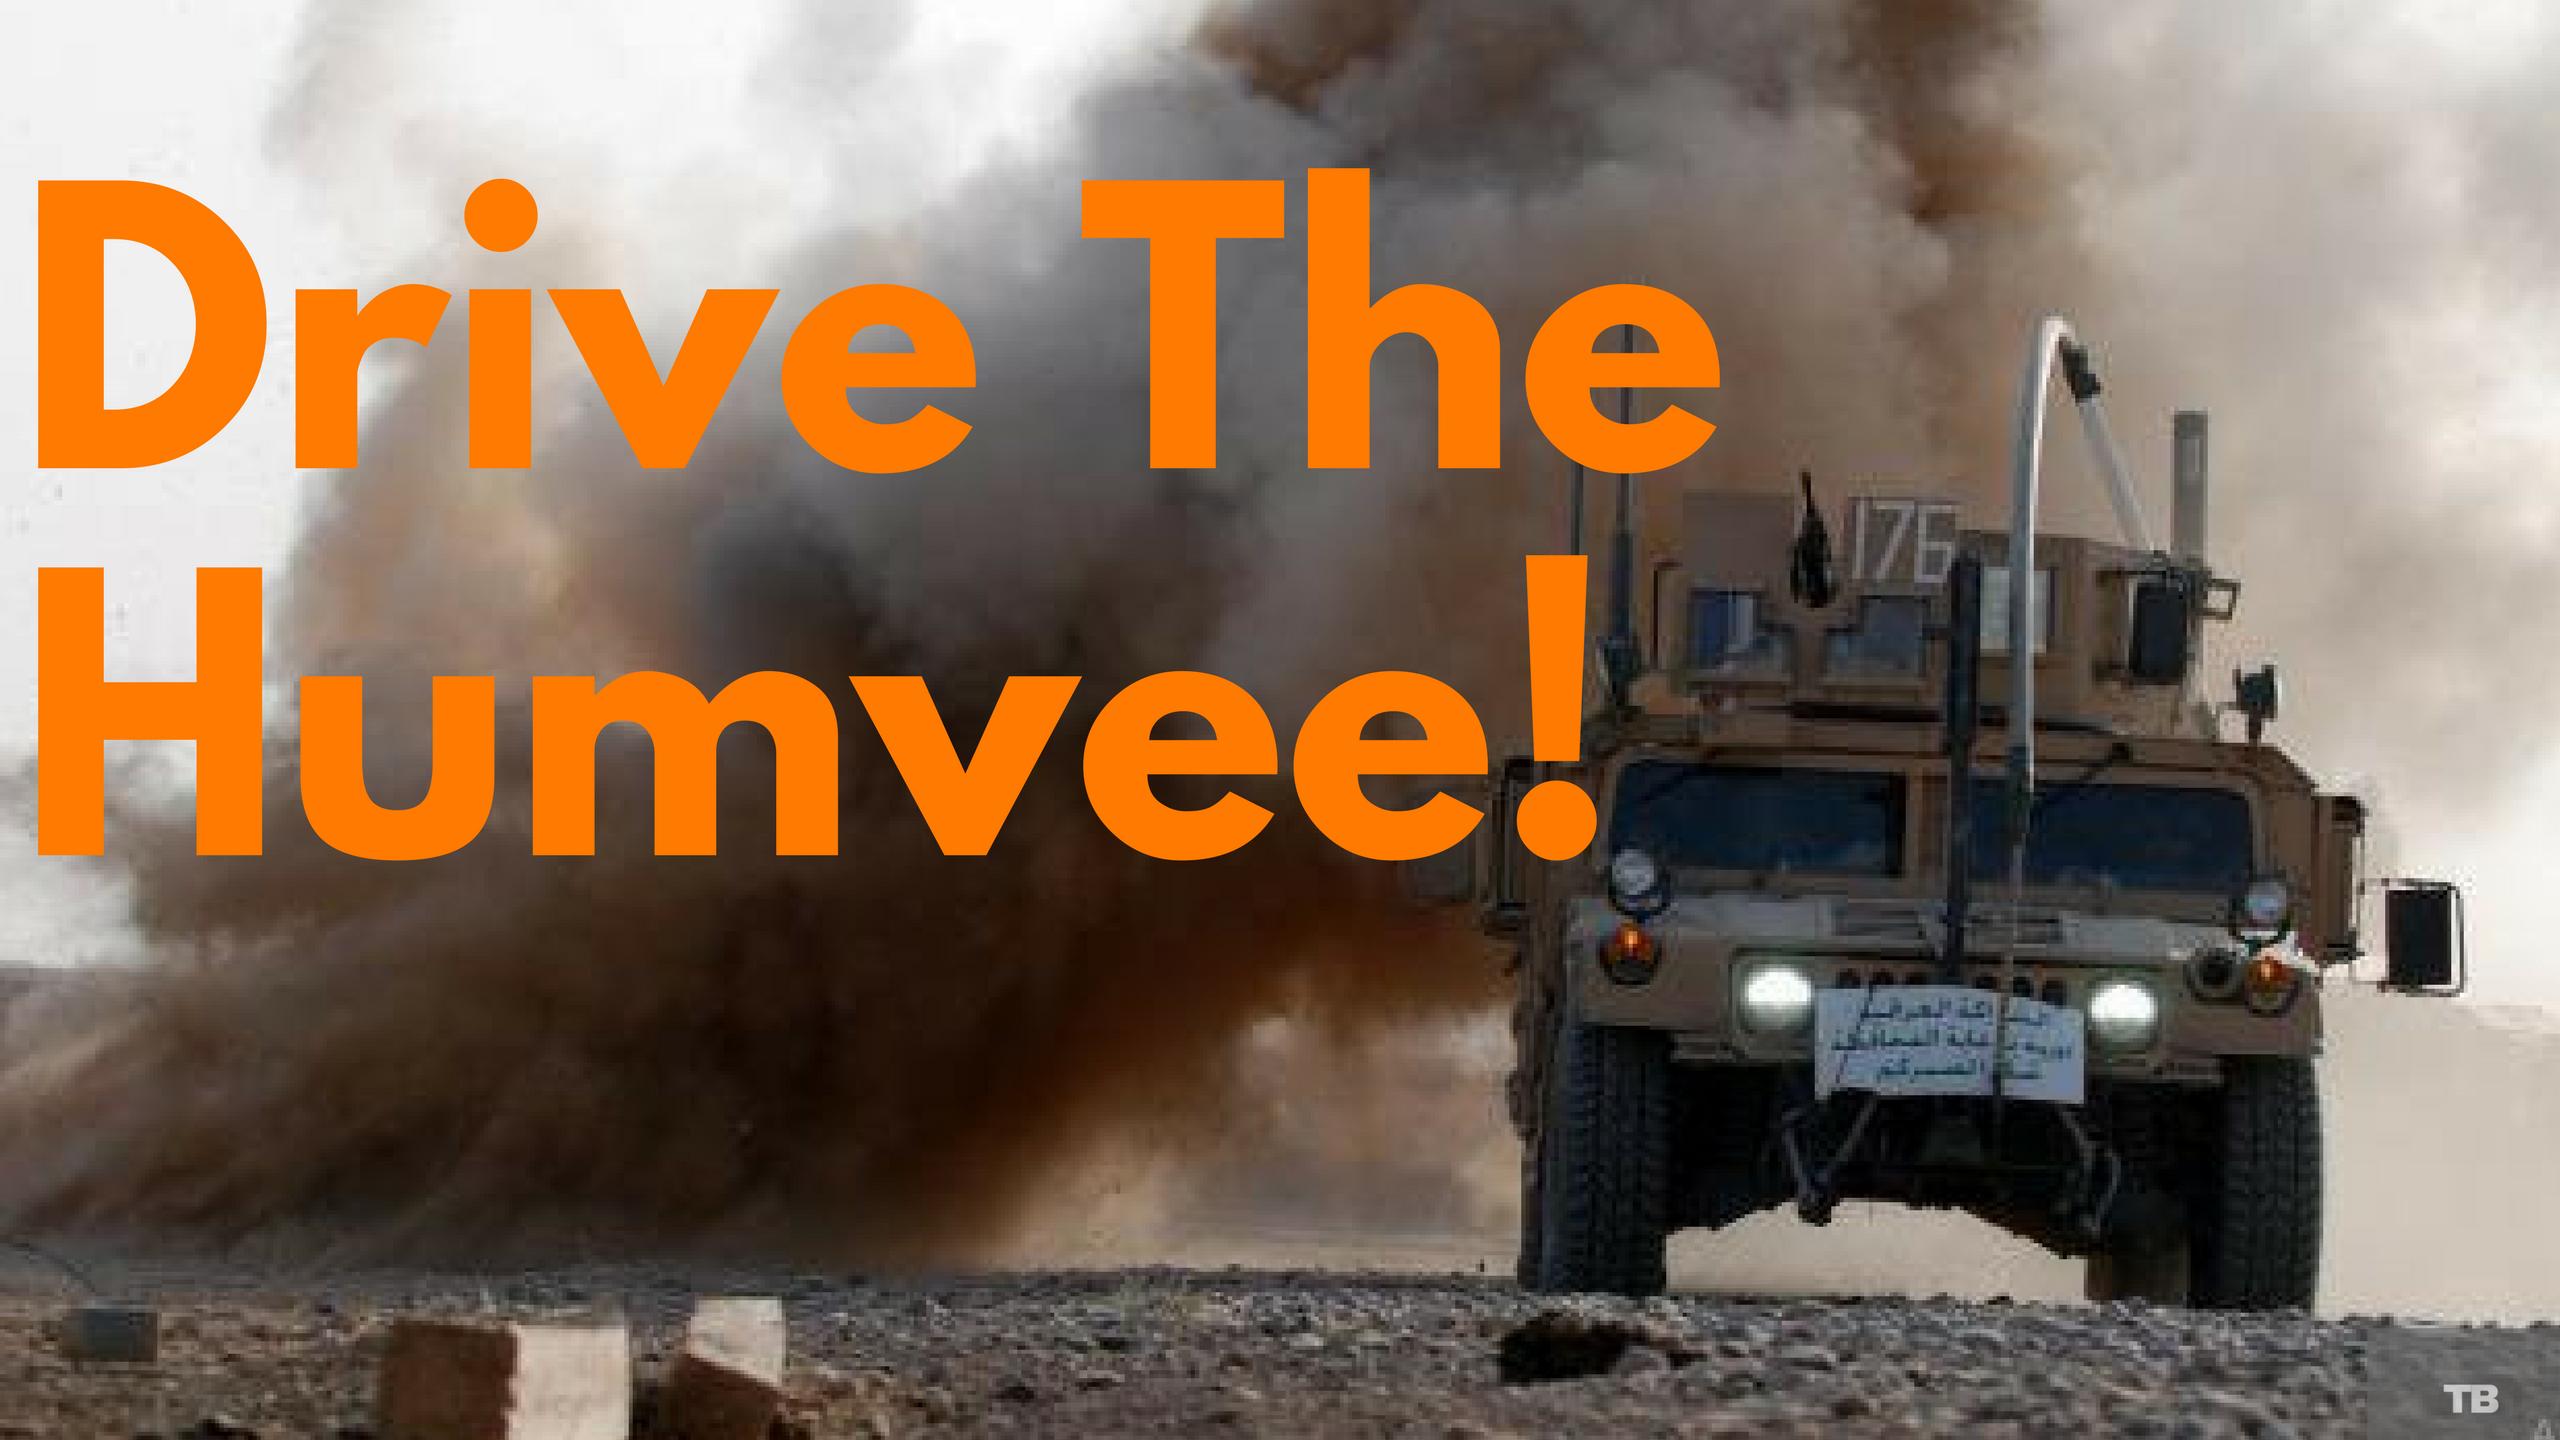 Drive the Humvee